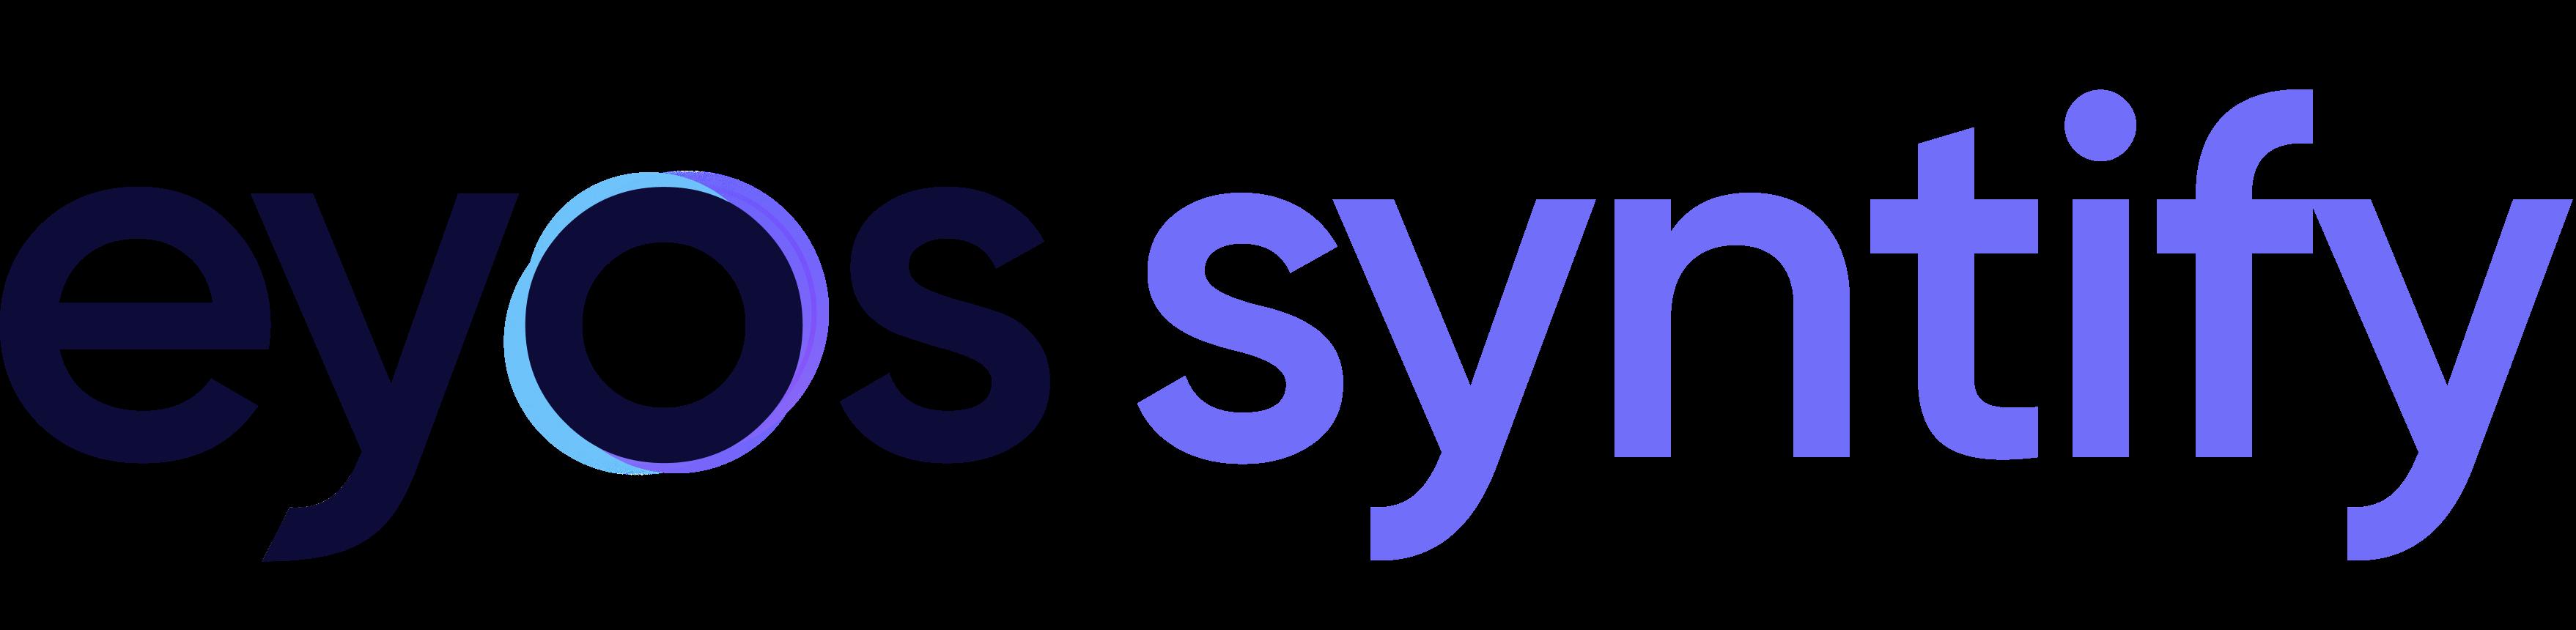 eyos-syntify-brand-marketers-logo